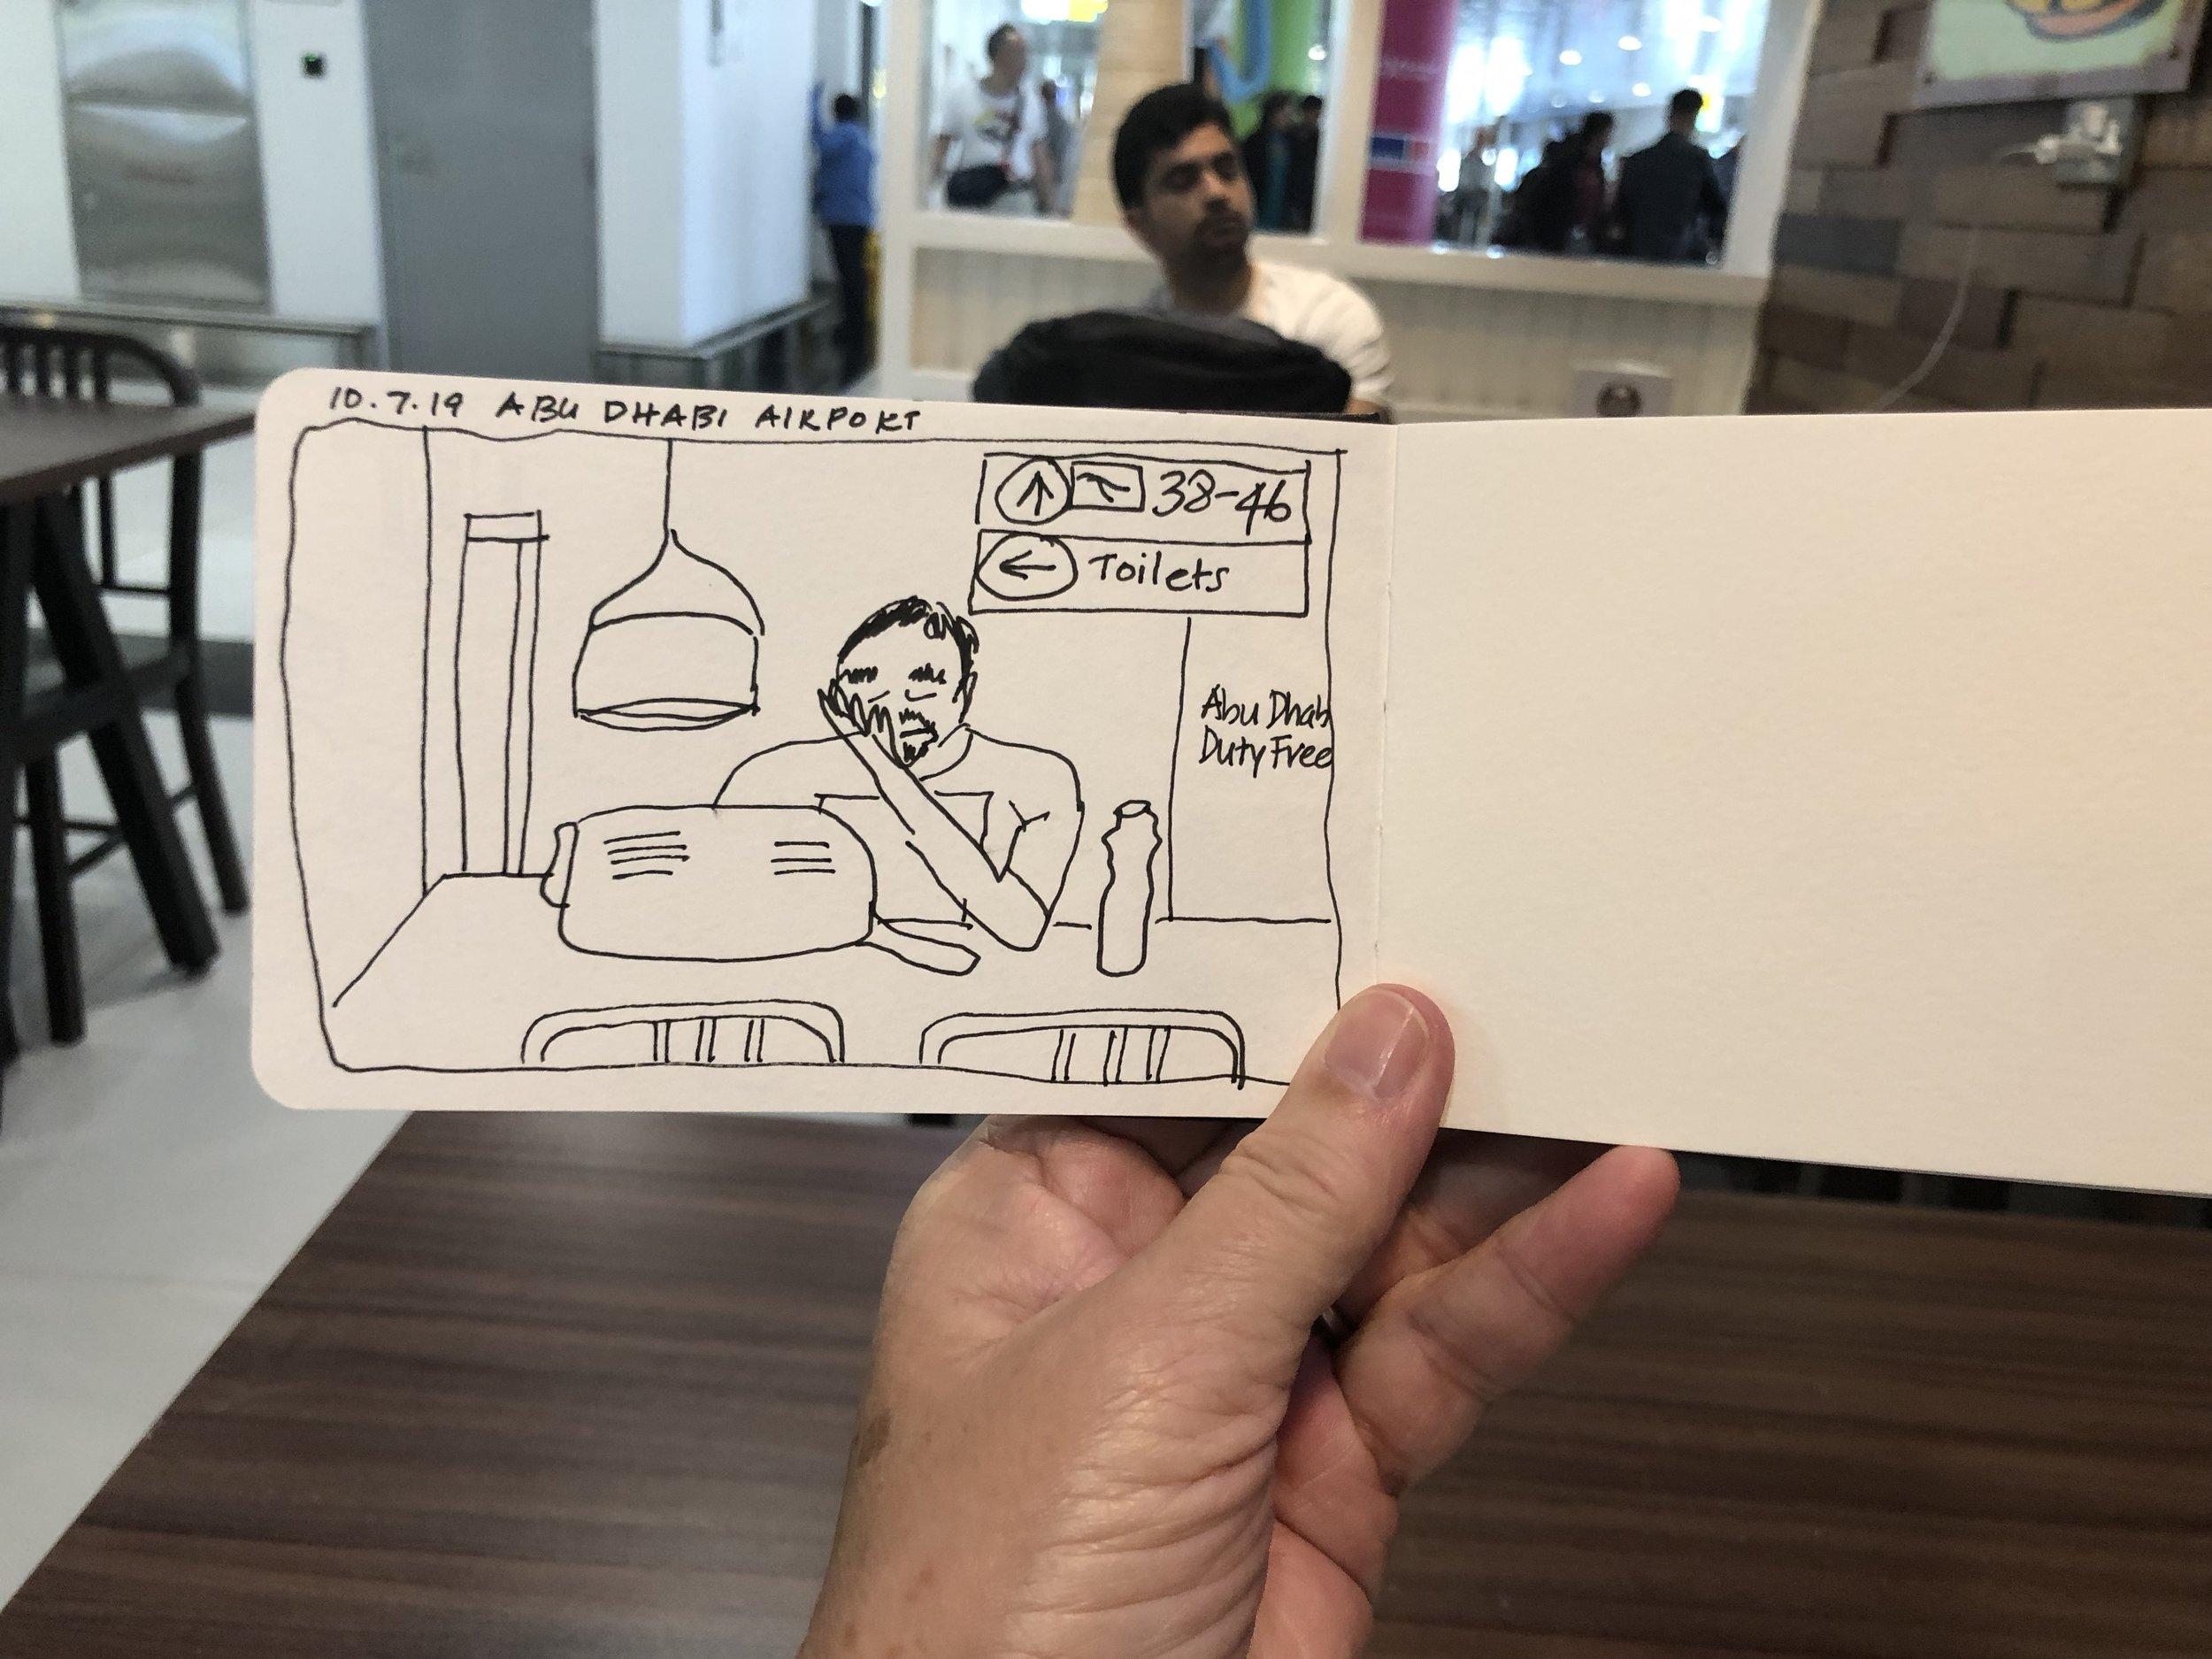 Abu Dhabi traveller